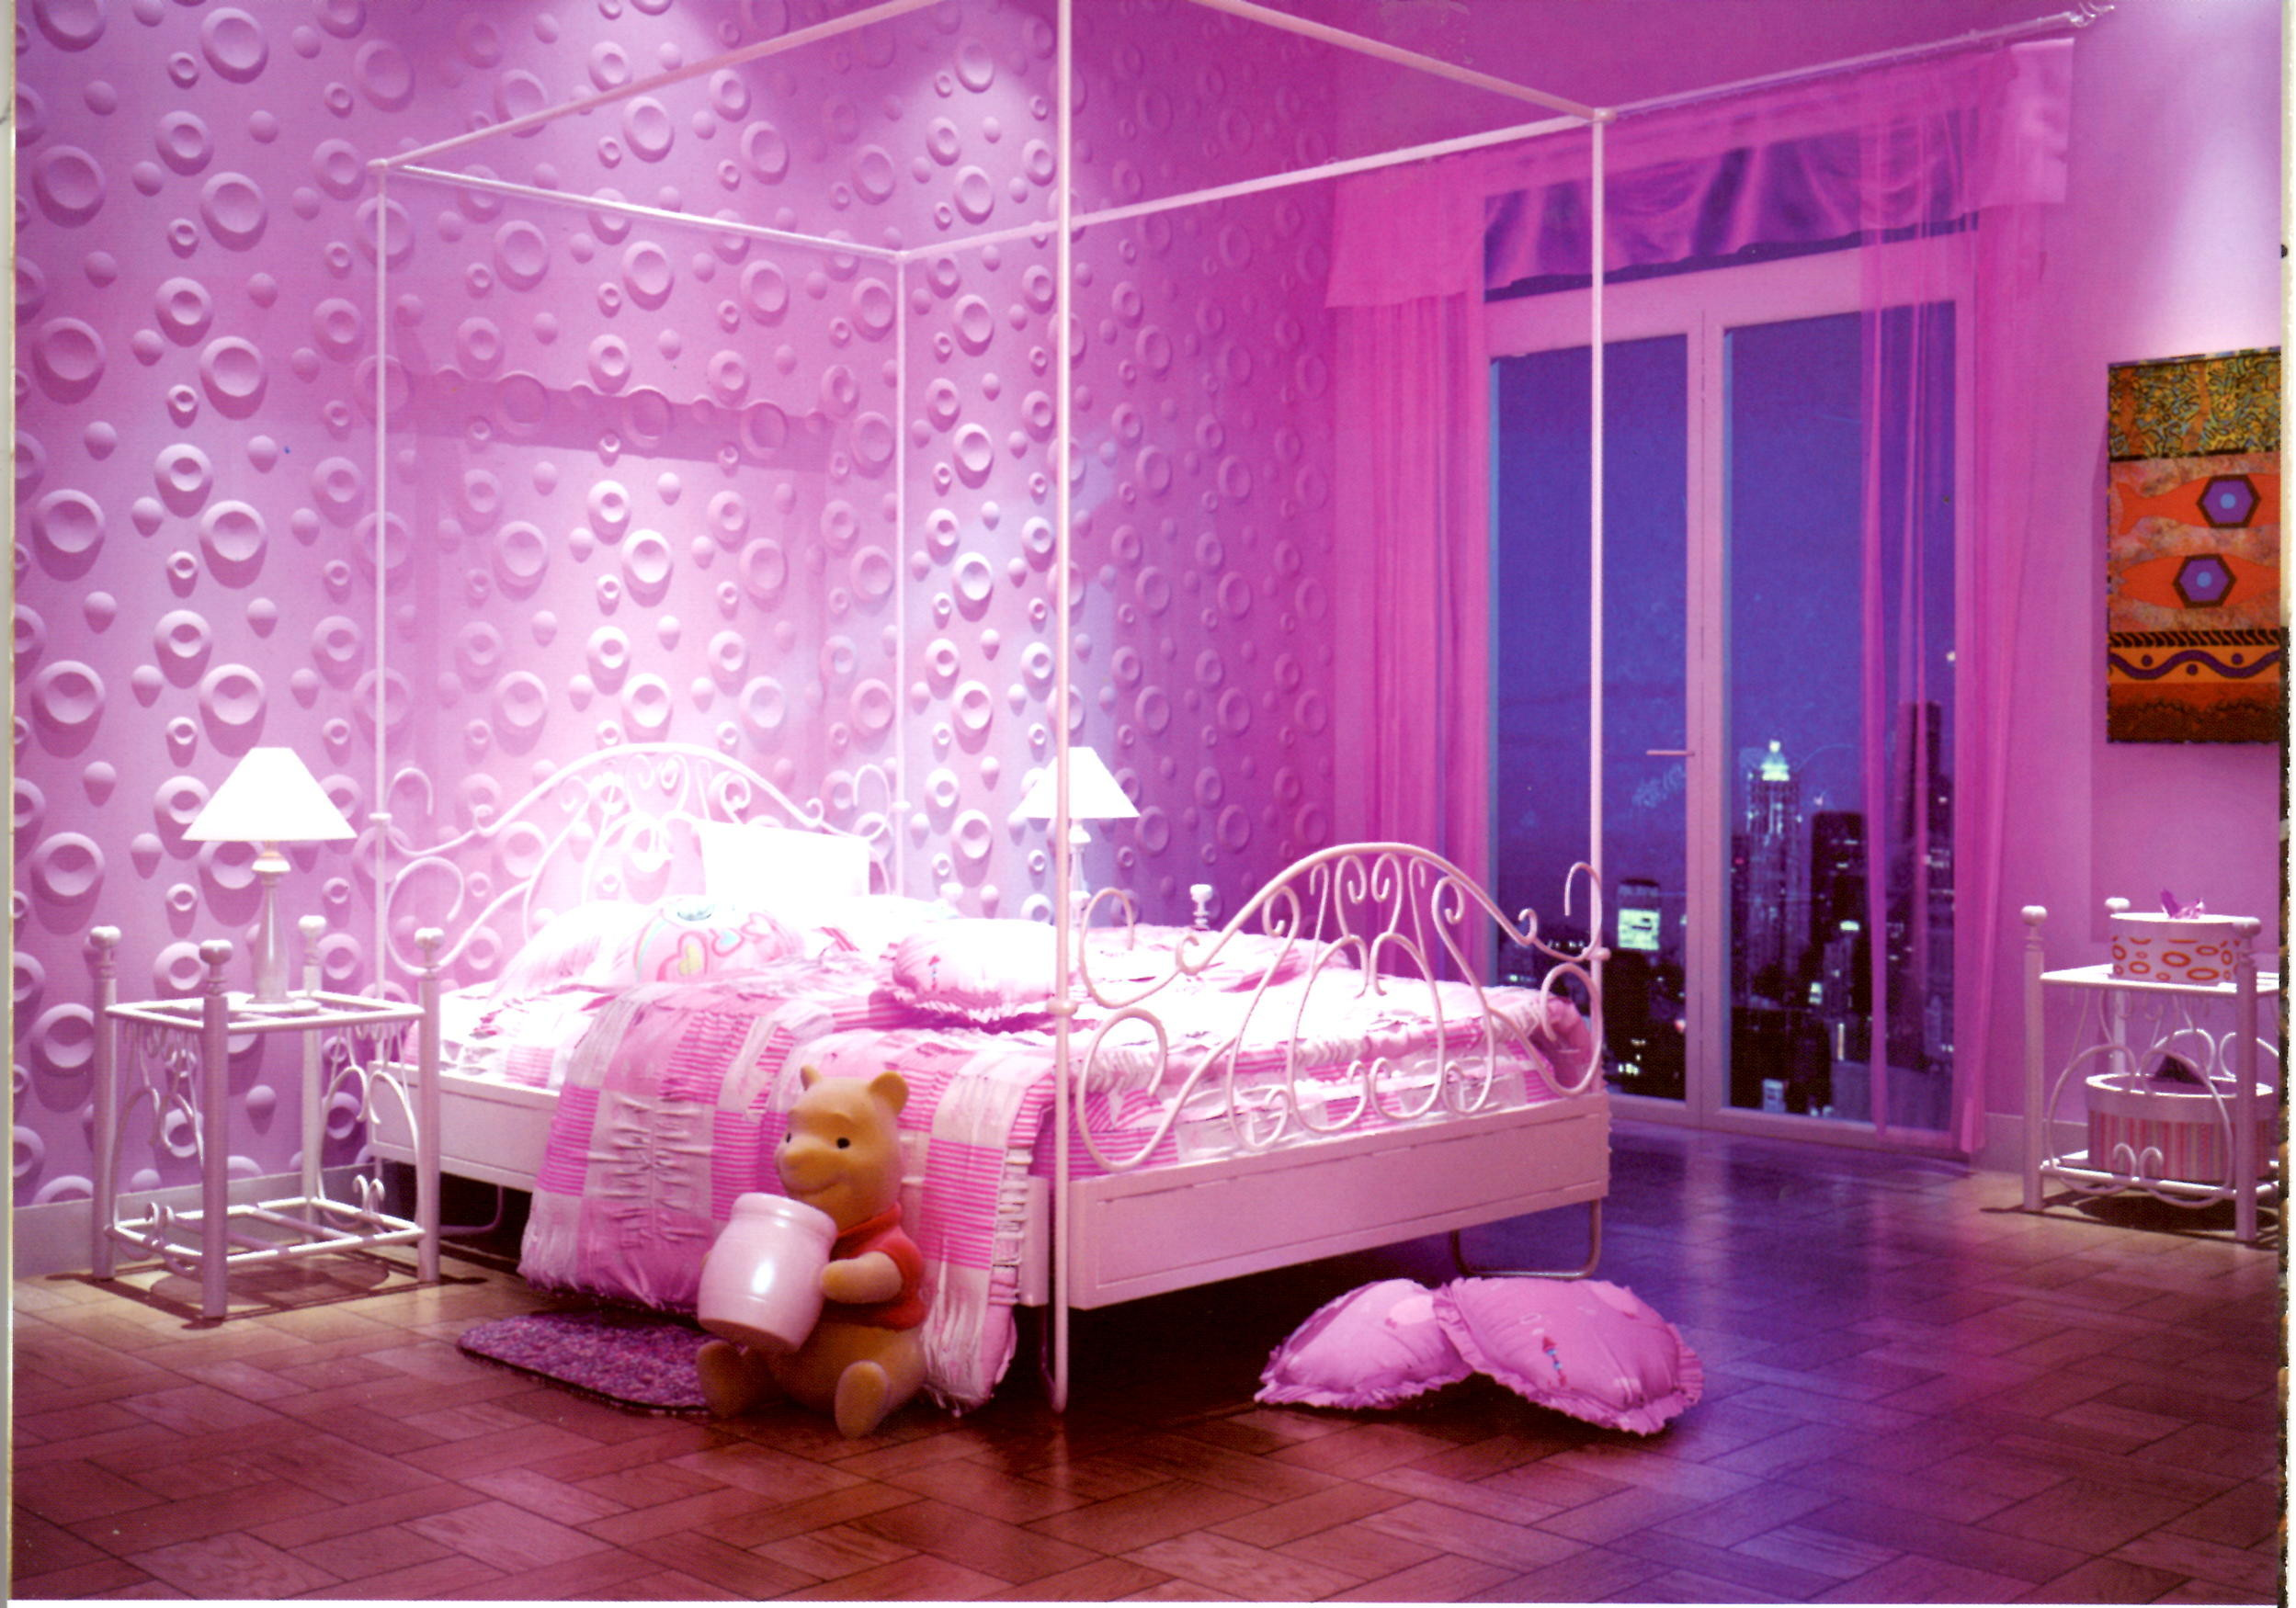 Pink Wallpaper for Girls Room (34+ images)